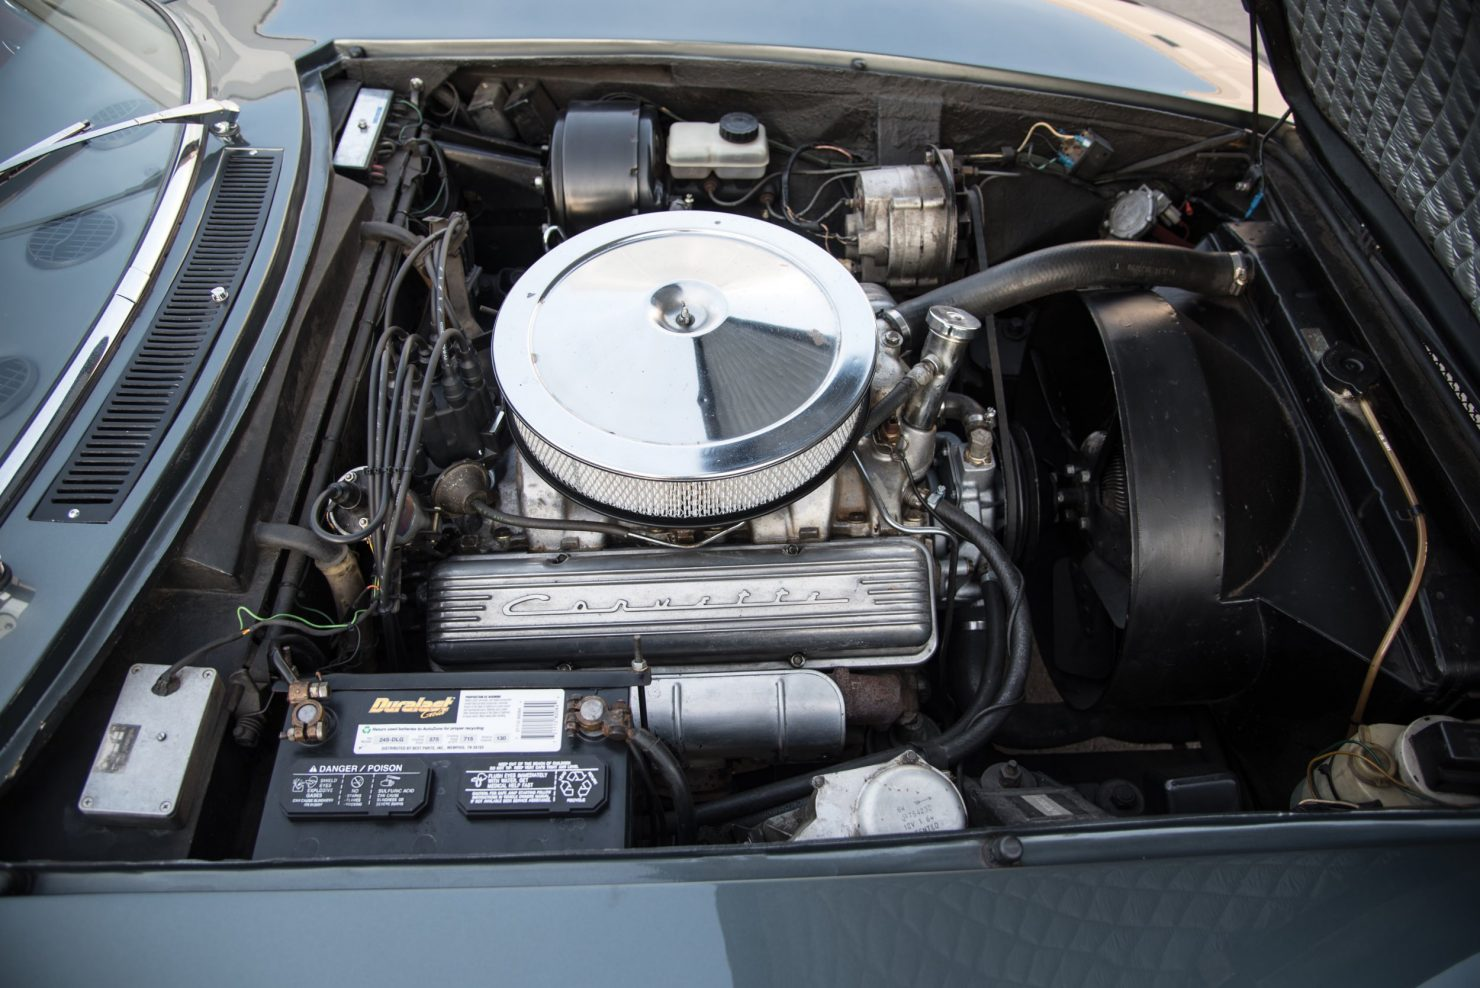 iso grifo car 22 1480x988 - 1966 Iso Grifo GL Series I